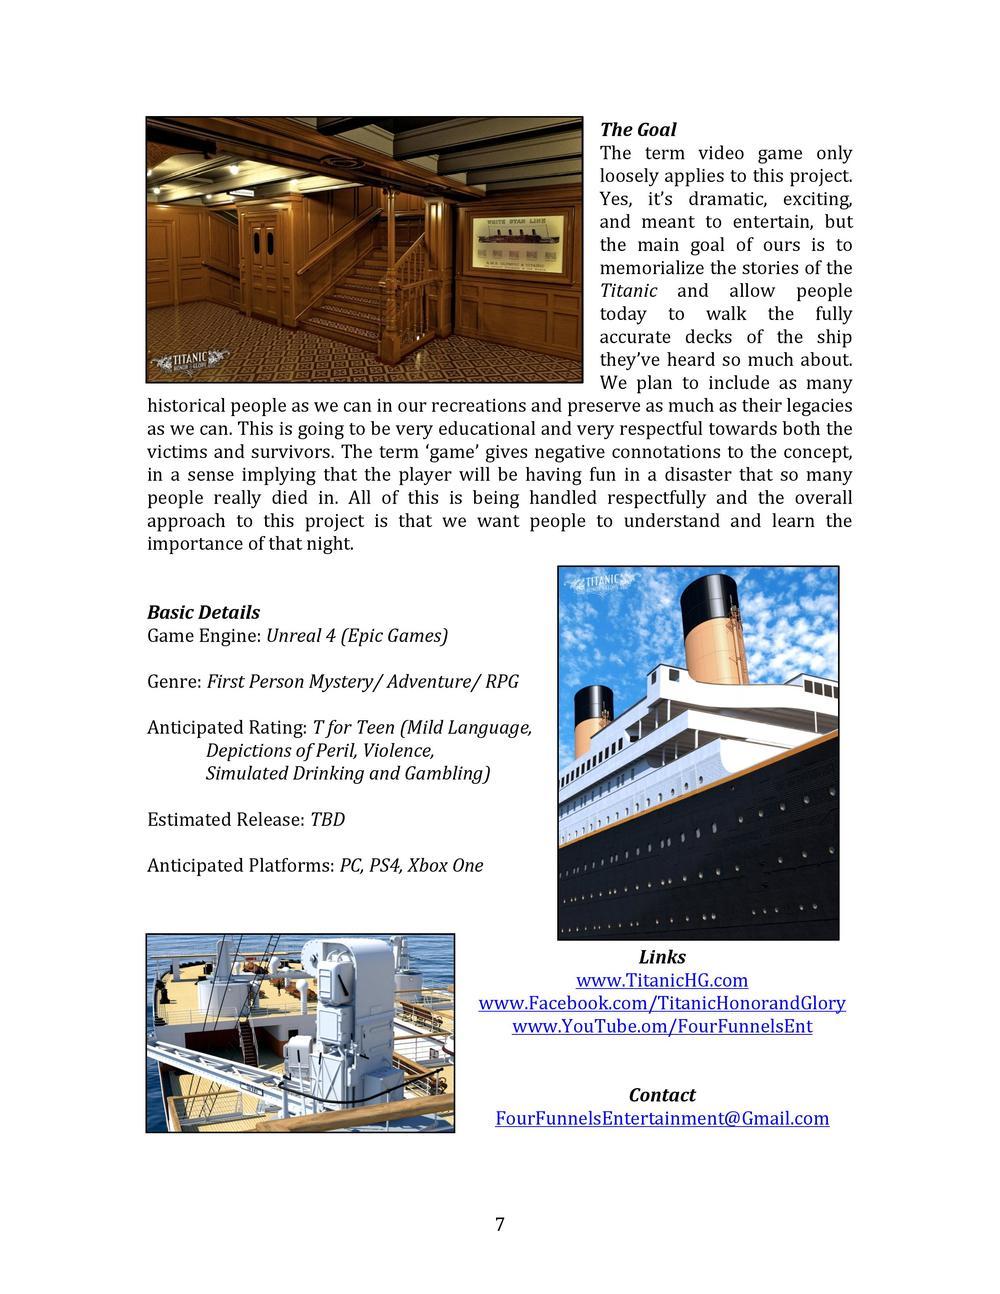 Press Release 1c-page-007.jpg